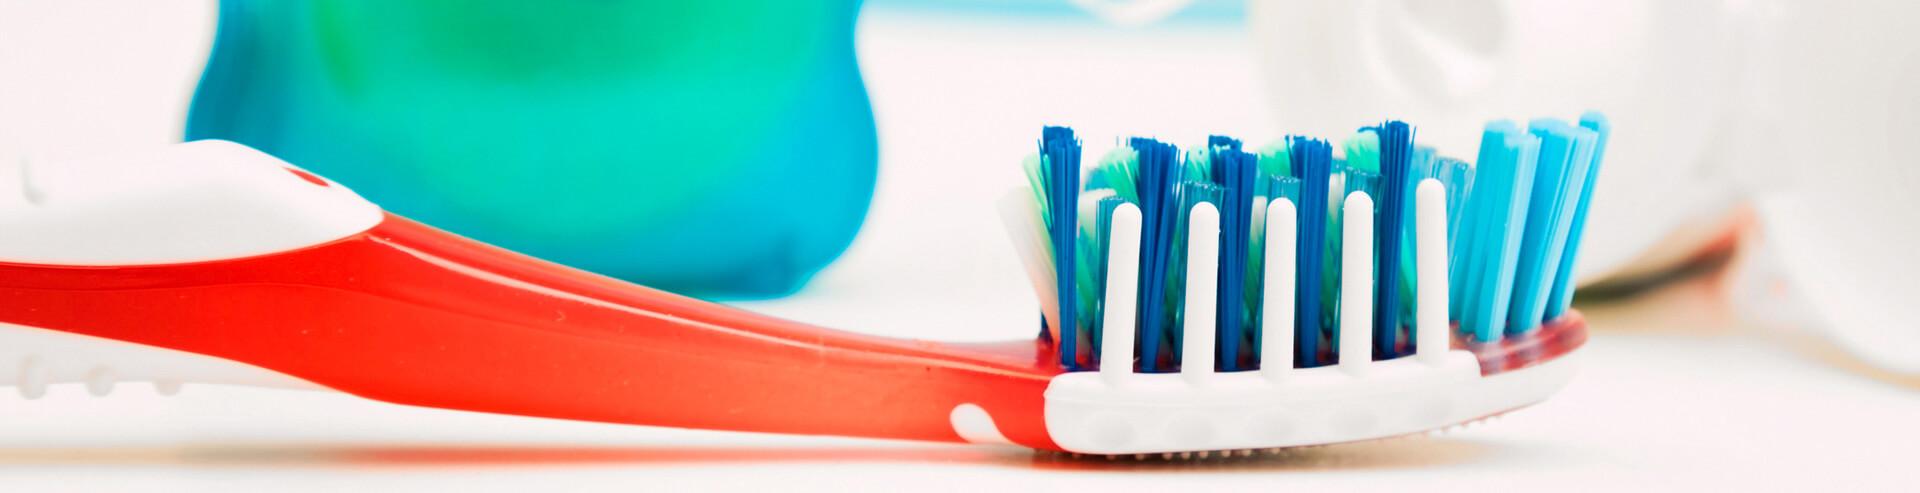 General Dentistry & Hygiene